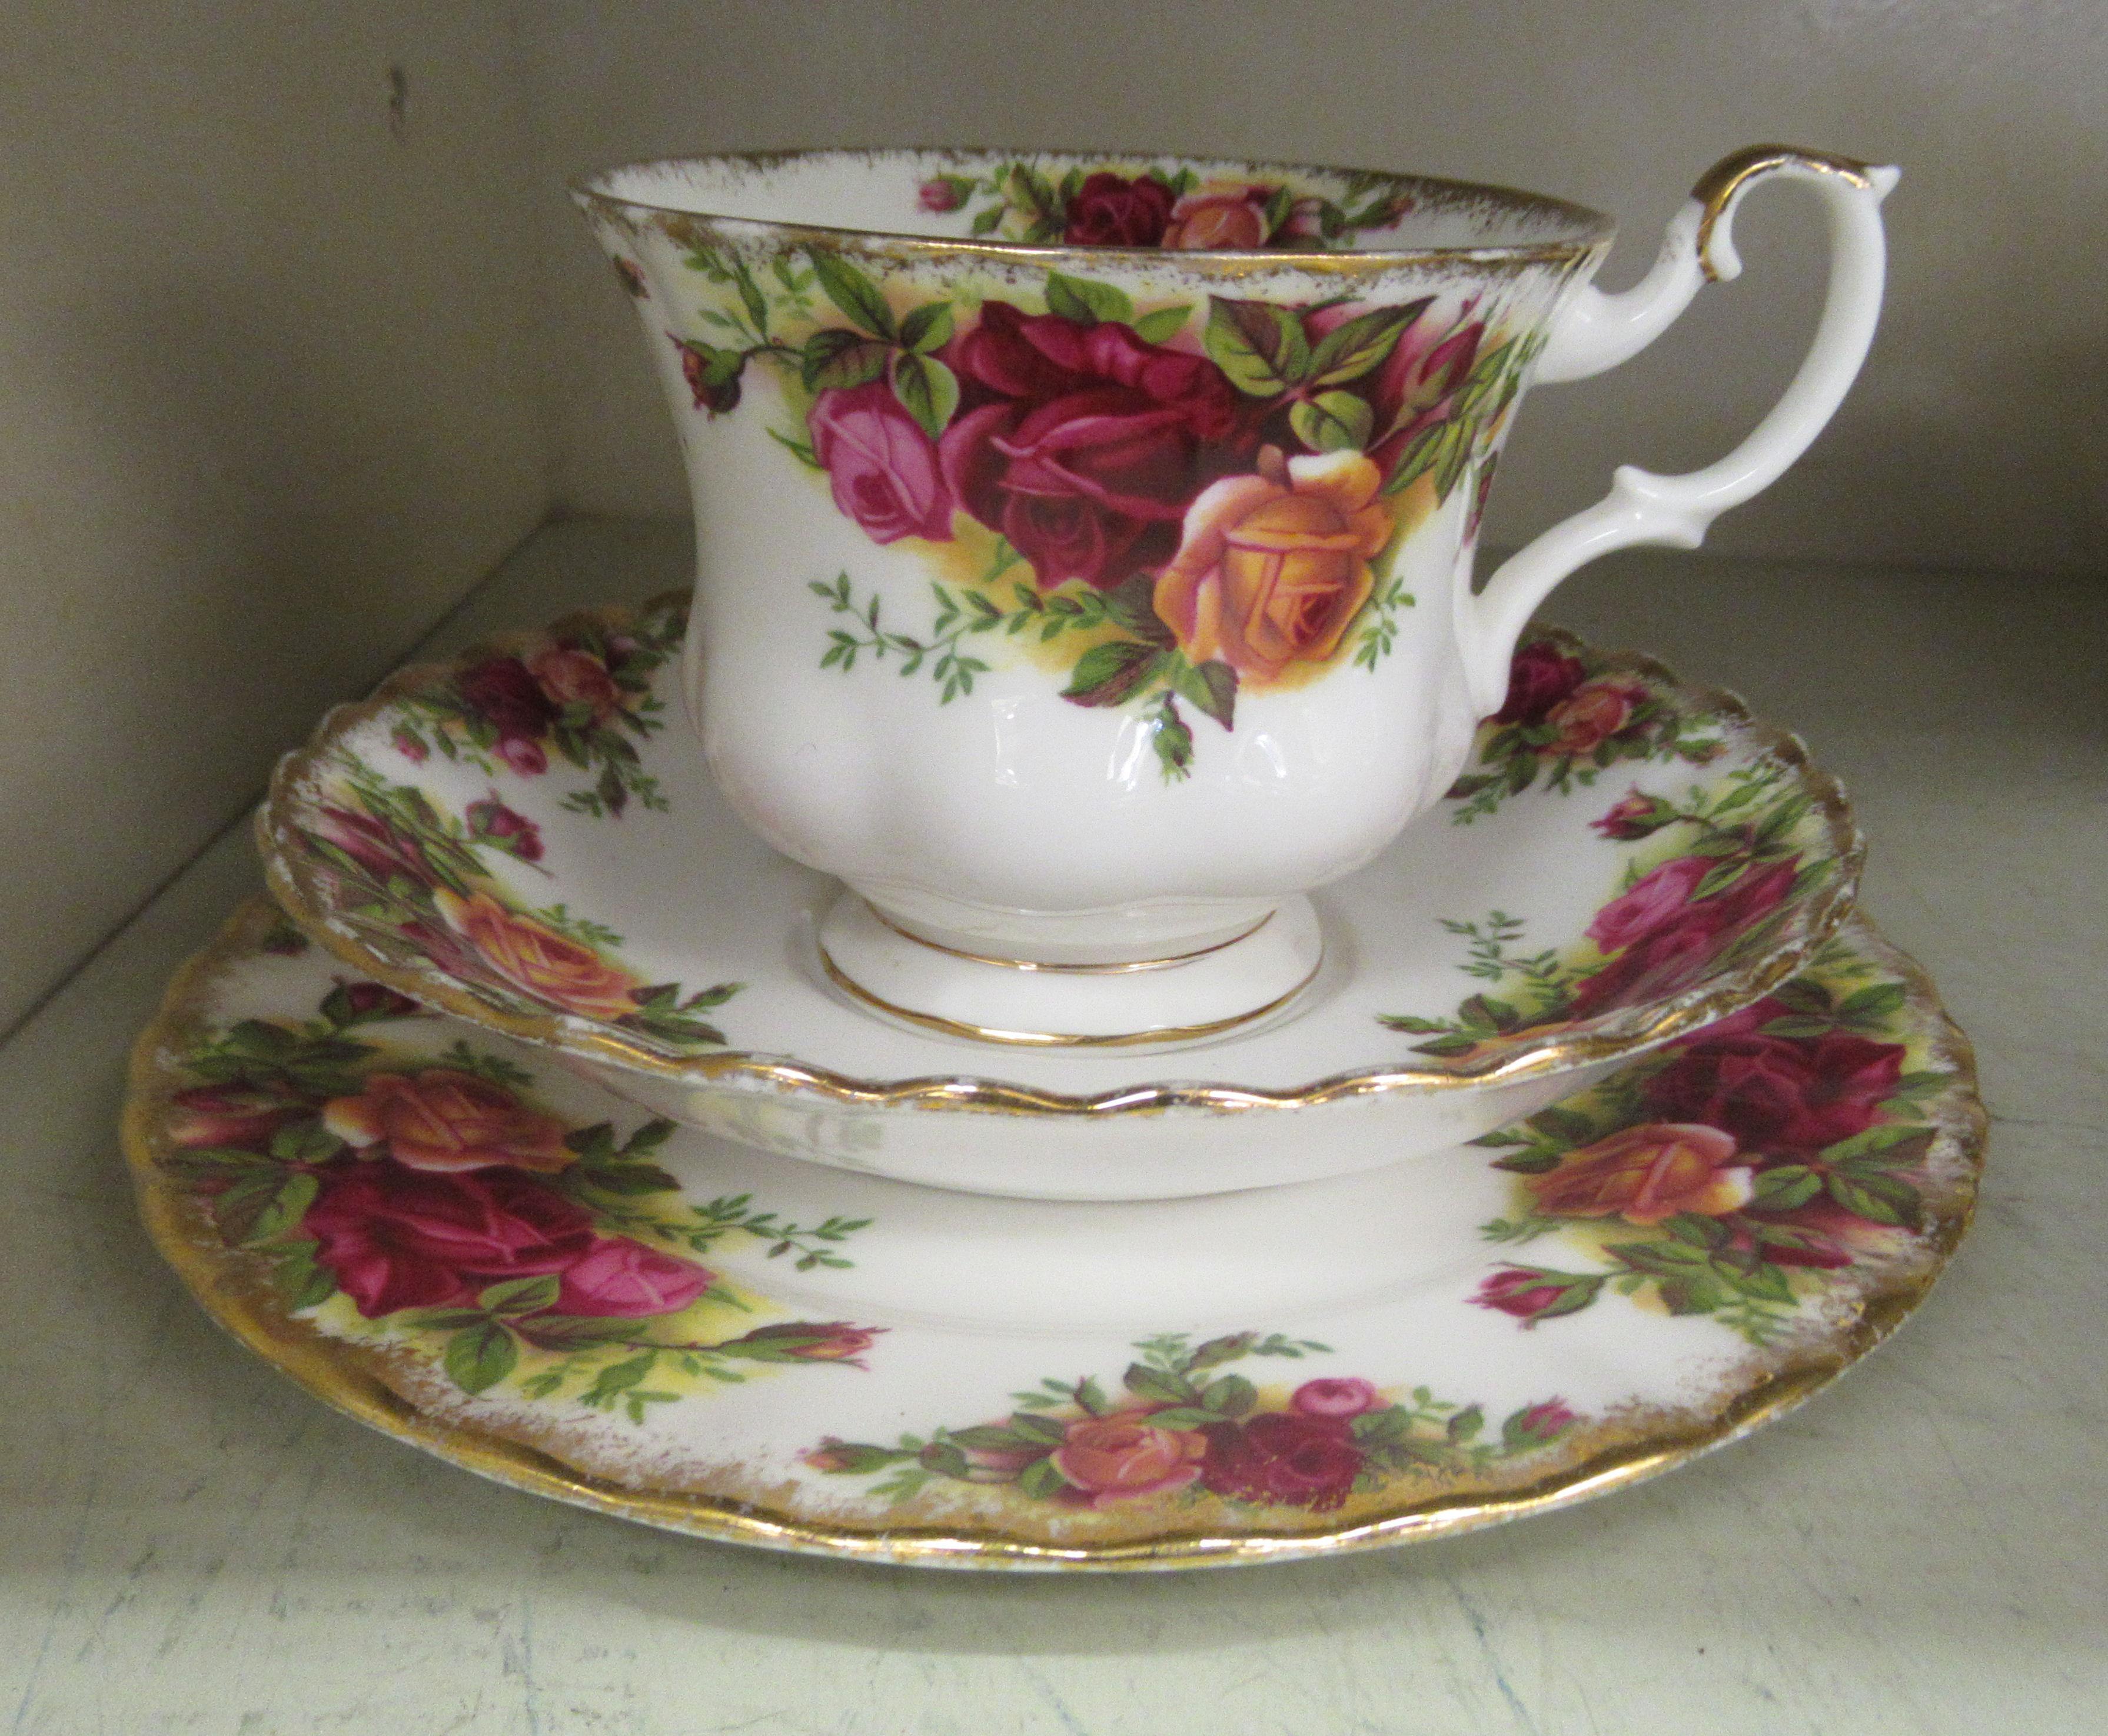 Six Royal Albert bone china Old Country Roses pattern trios - Image 2 of 3